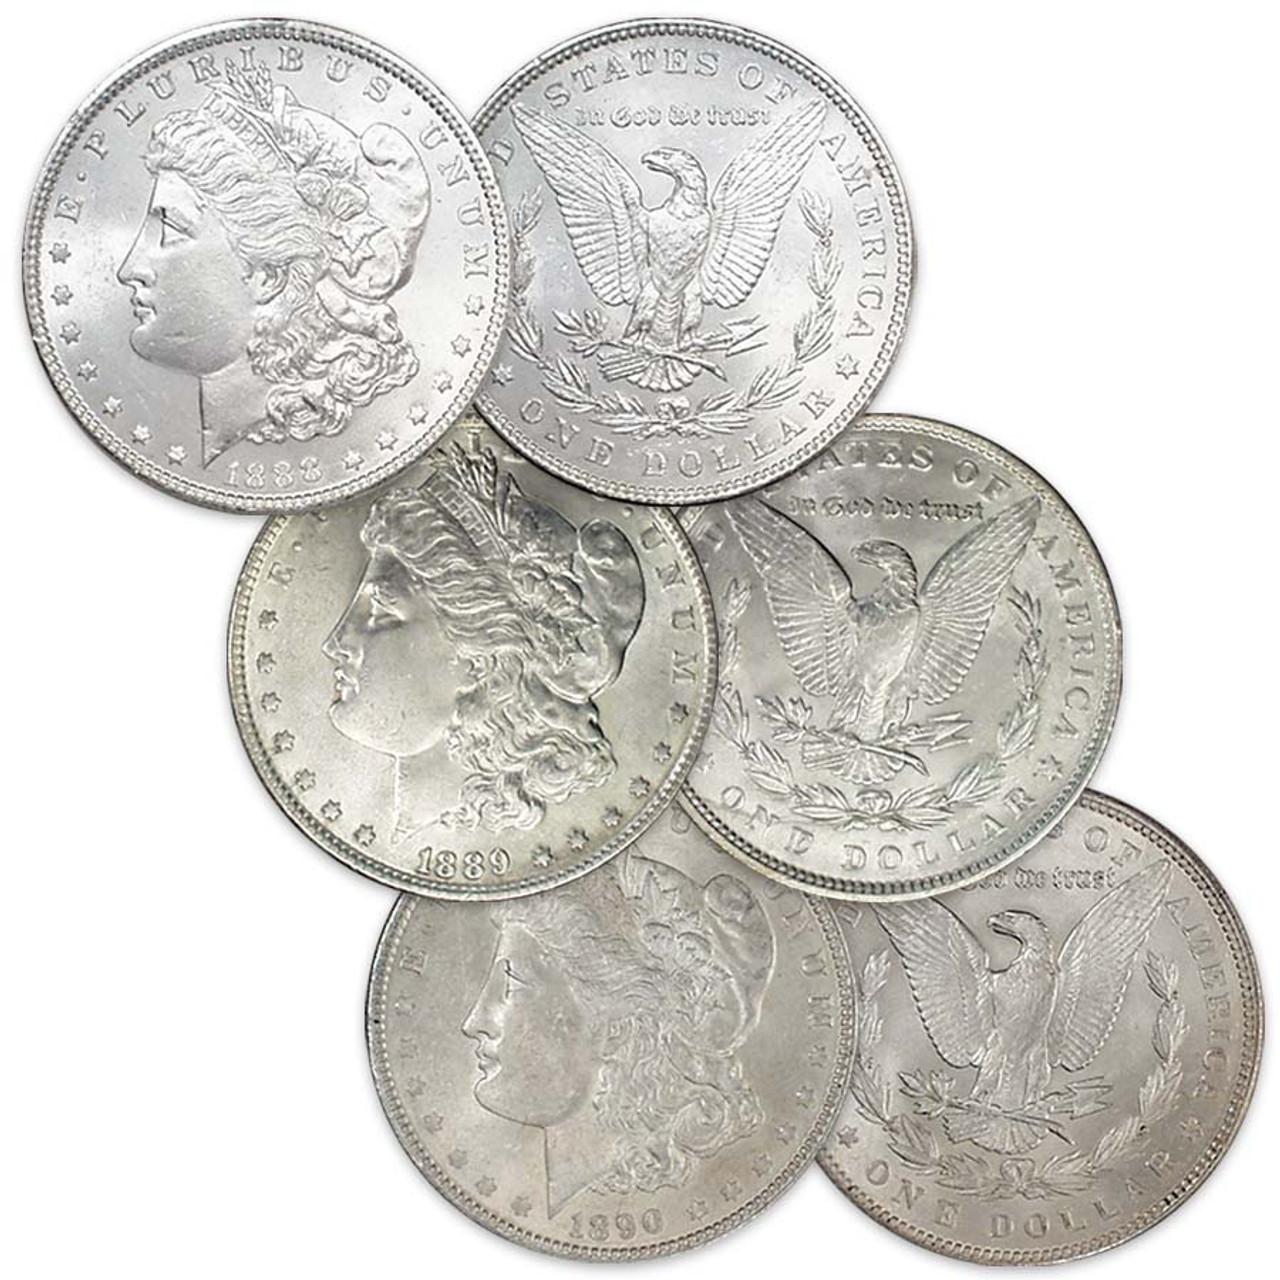 BU 1890-P Morgan Silver Dollar Brilliant Uncirculated